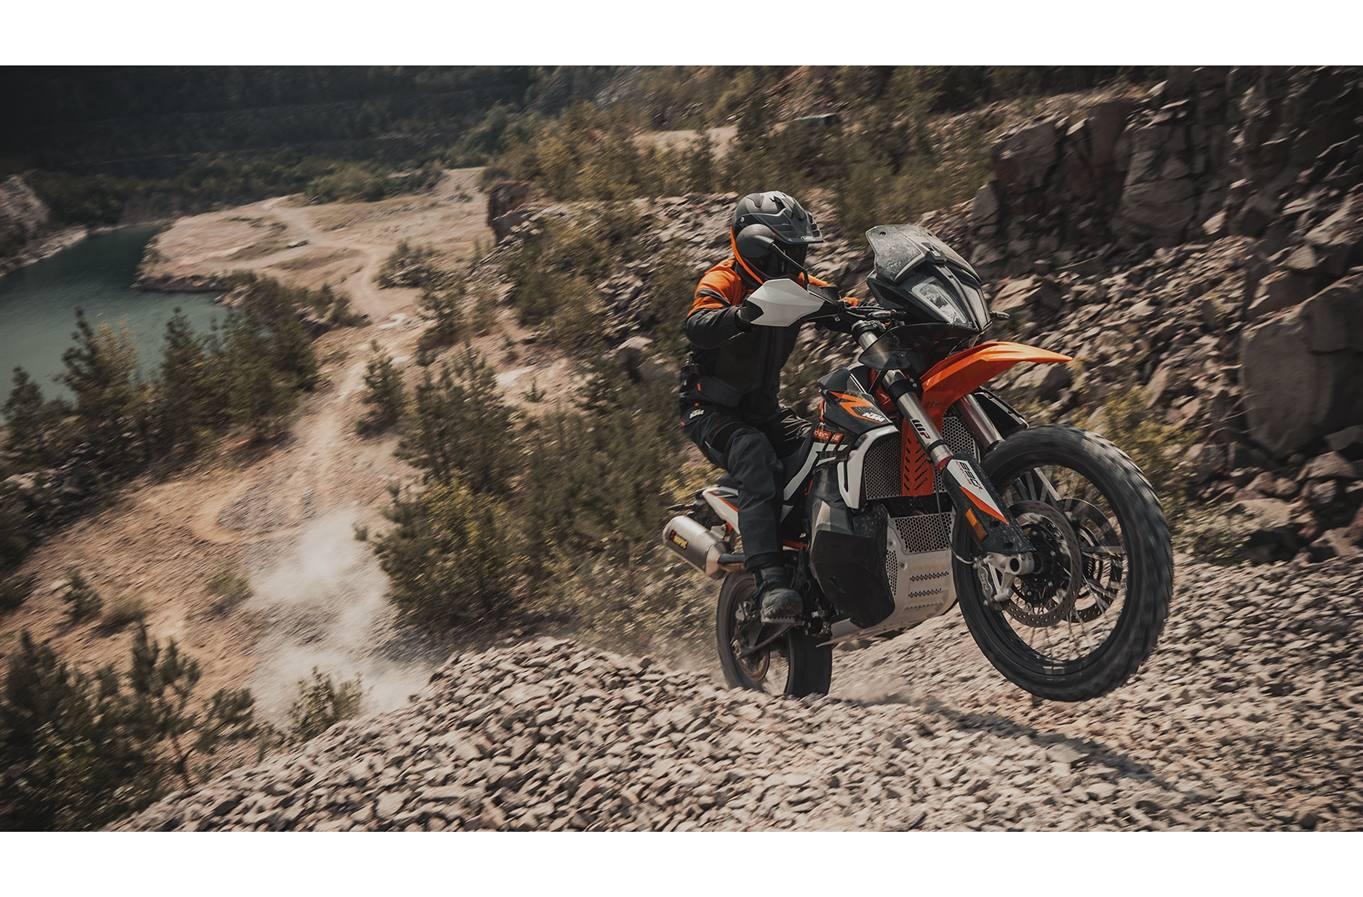 2020 KTM 390 Adventure for sale in Austin, TX. TJs Cycle